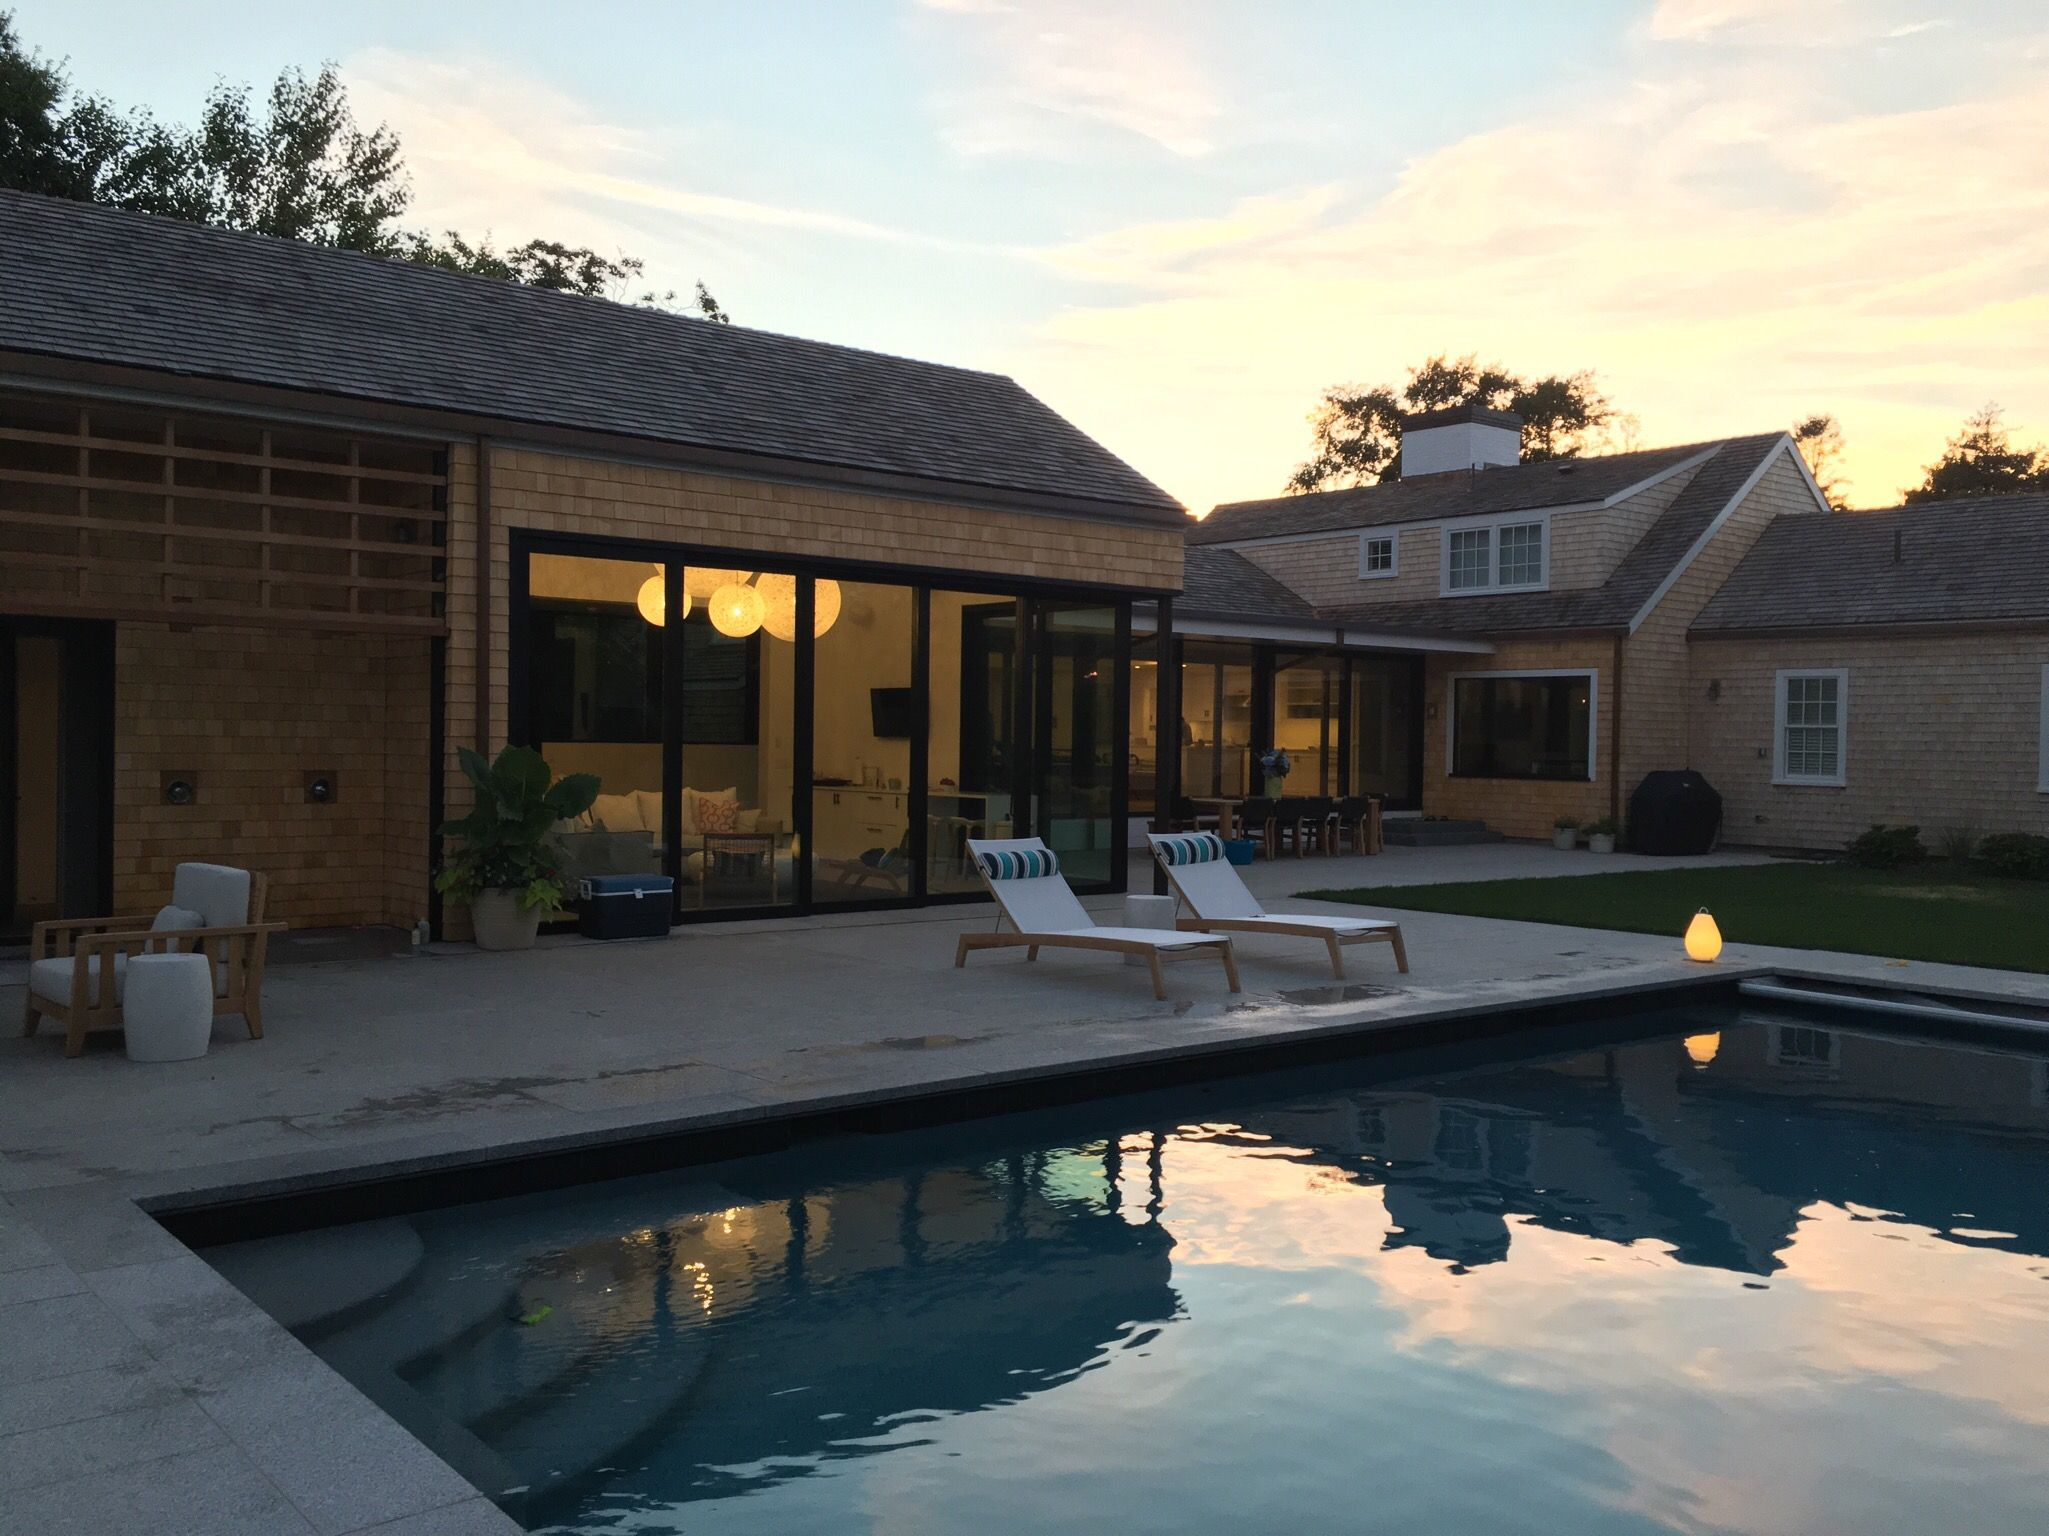 Pool House Extension Mooi Random Lights Sunbrella Fabric With